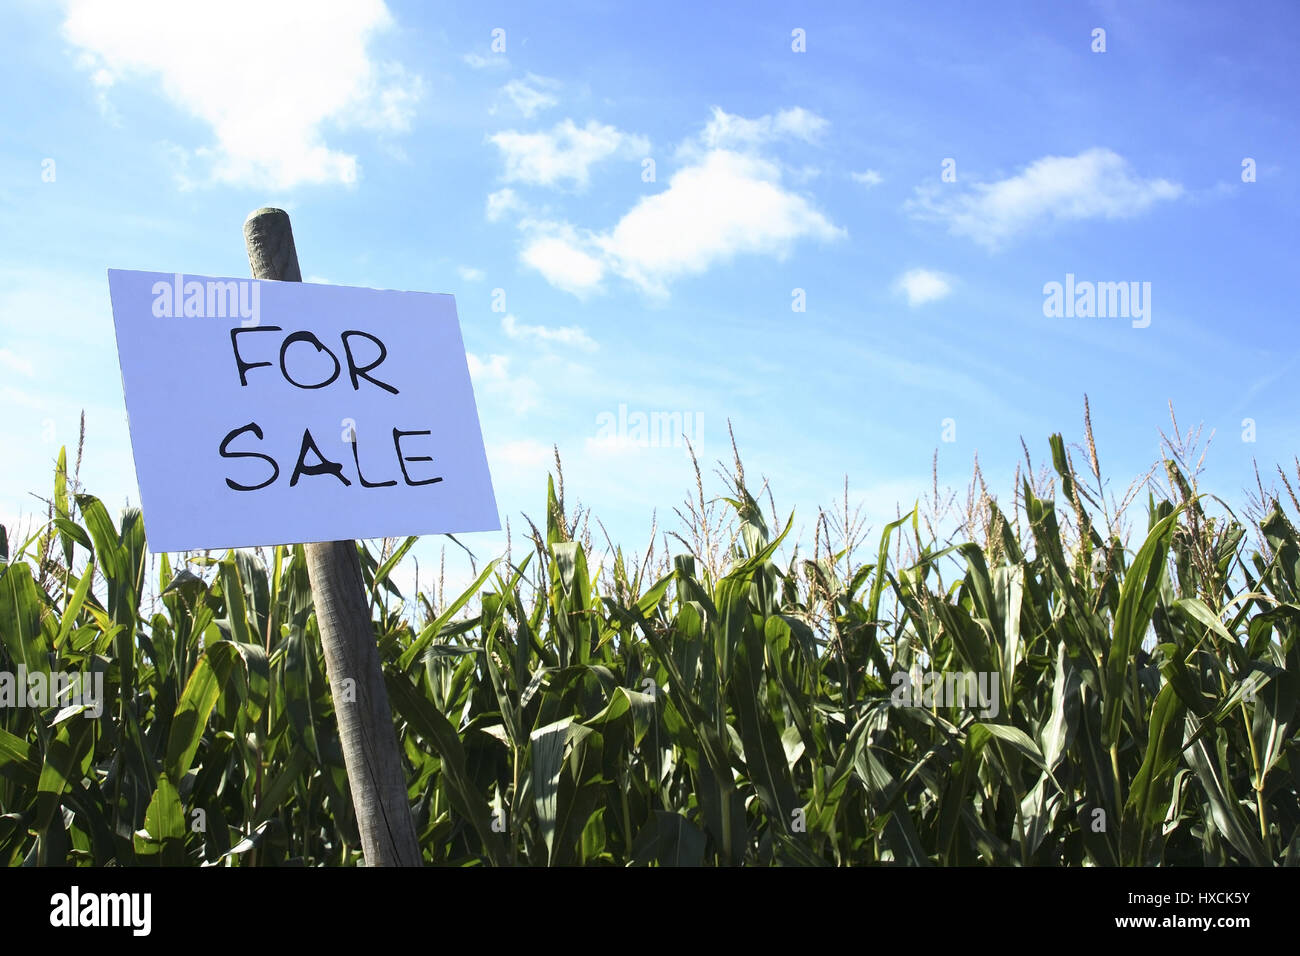 To sell corn field, Maisfeld zu verkaufen - Stock Image